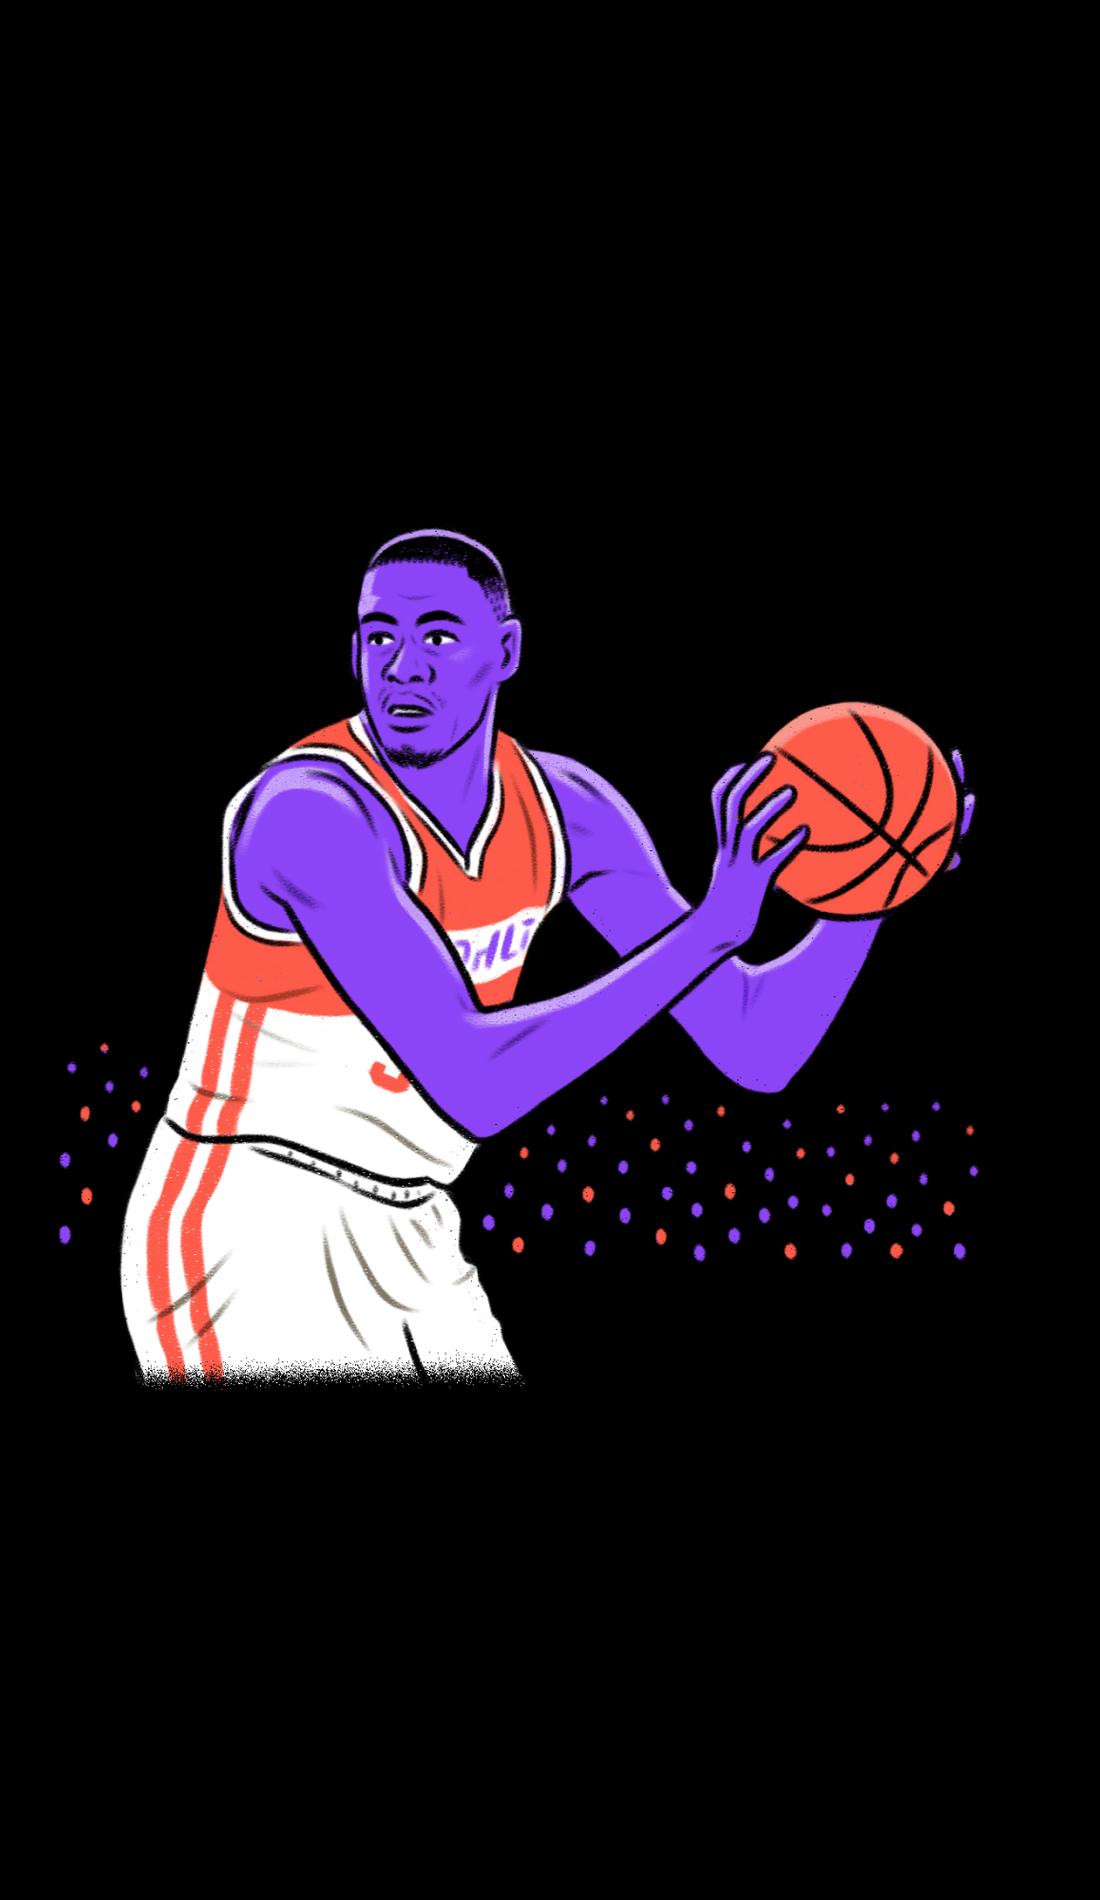 A Valparaiso Beacons Basketball live event